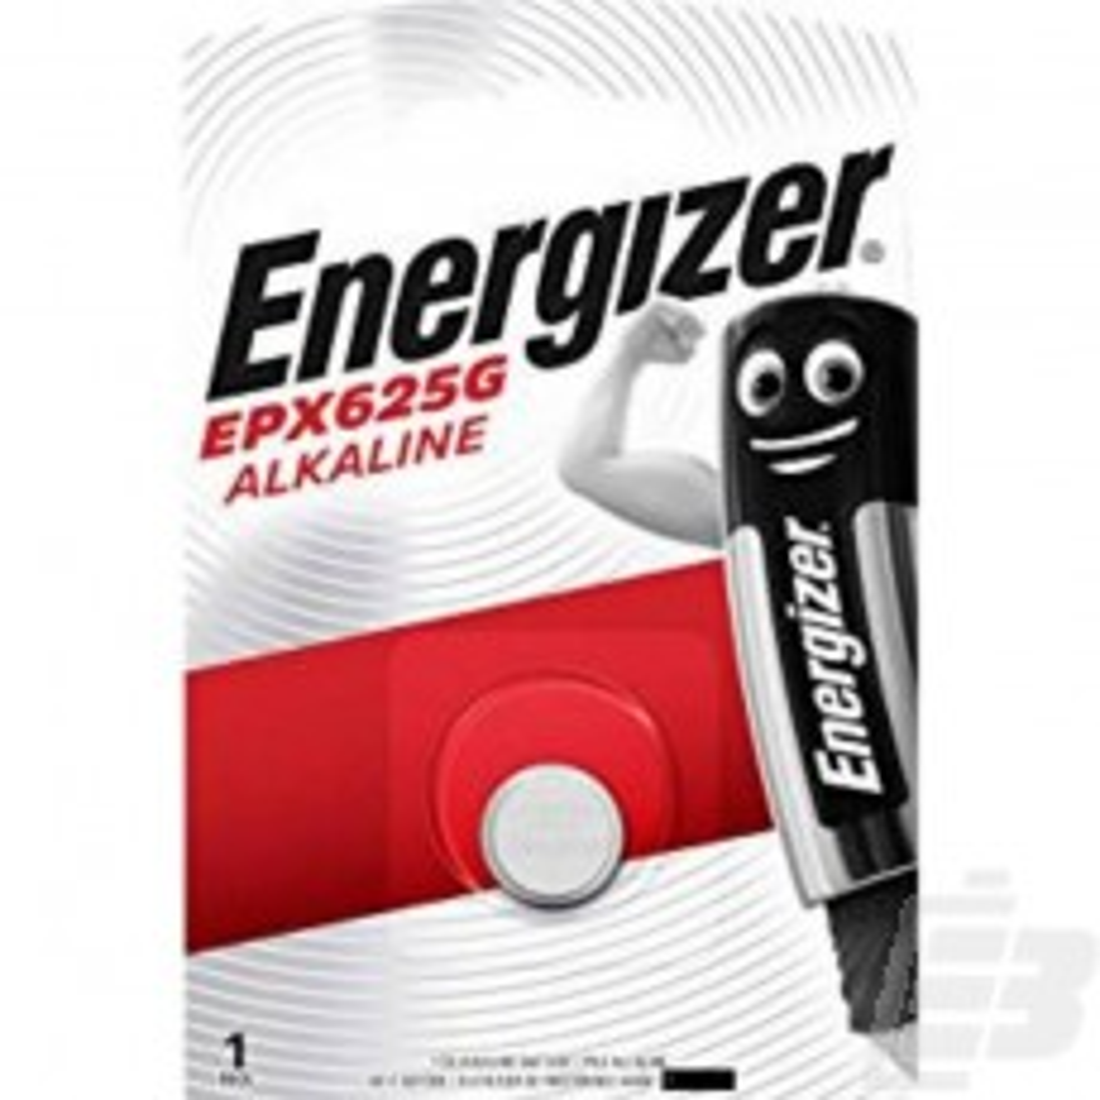 Energizer PX625 Alkaline Battery